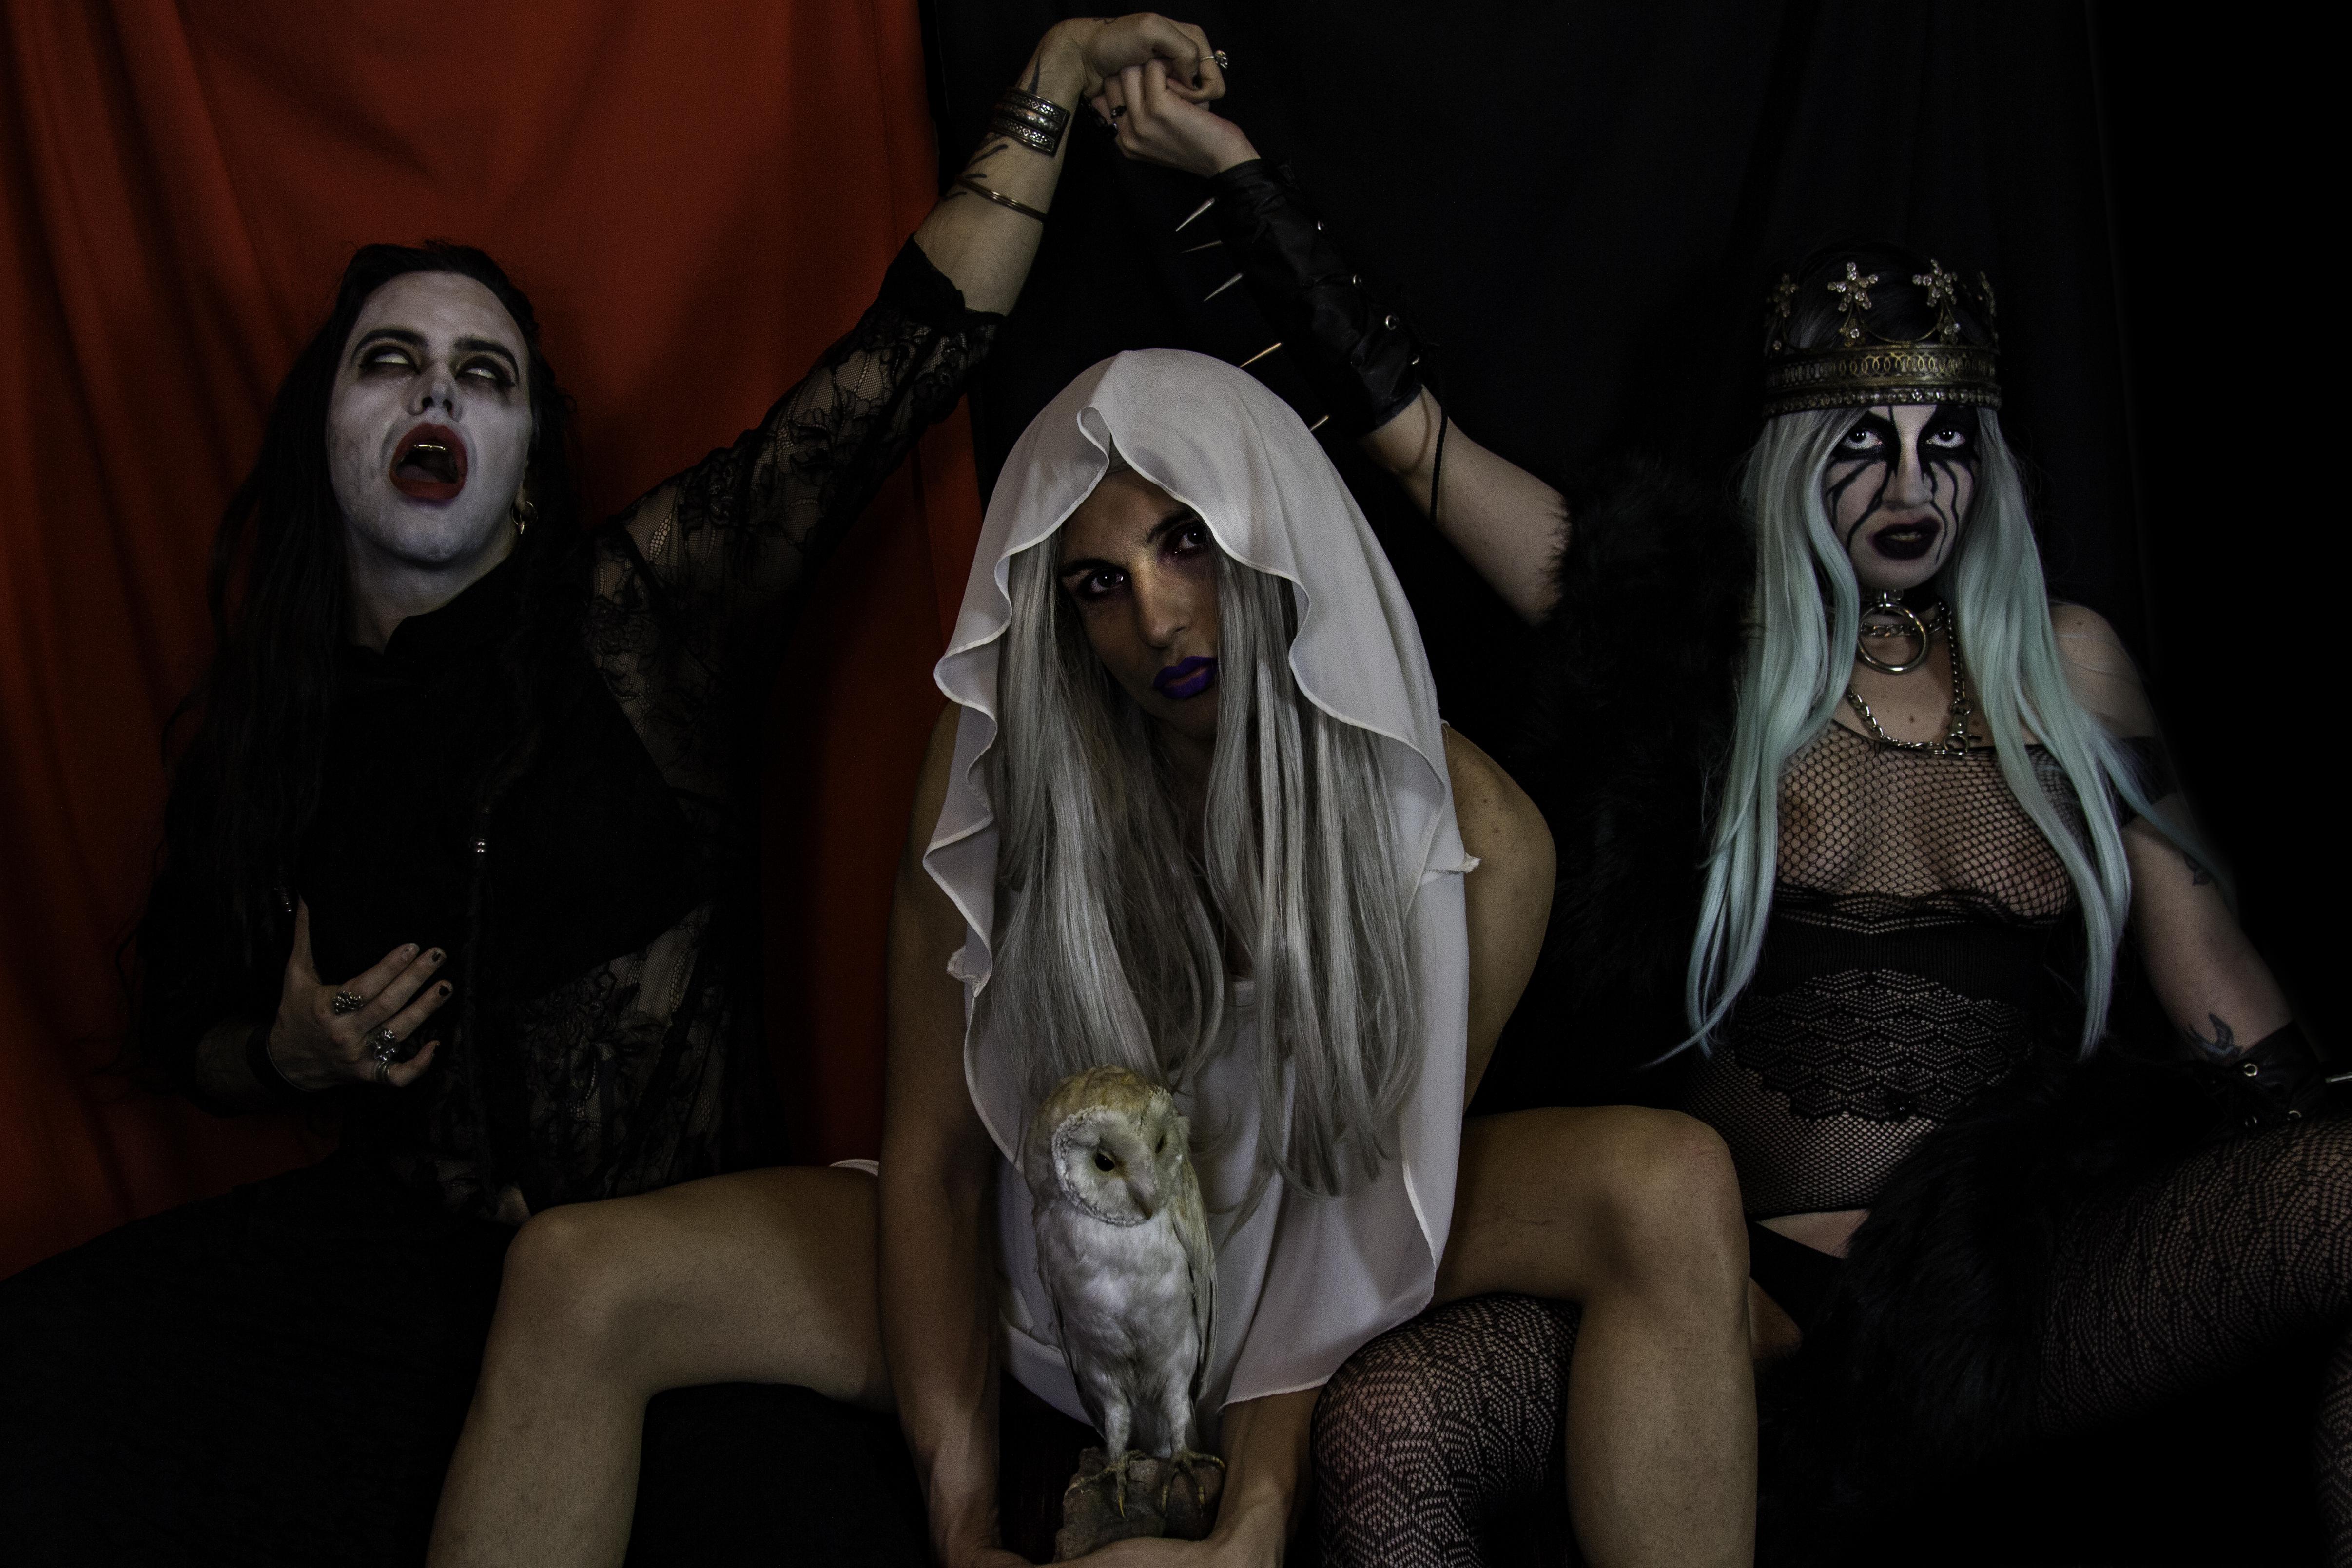 Transsexual metal band Peosphoros address censorship and free speech